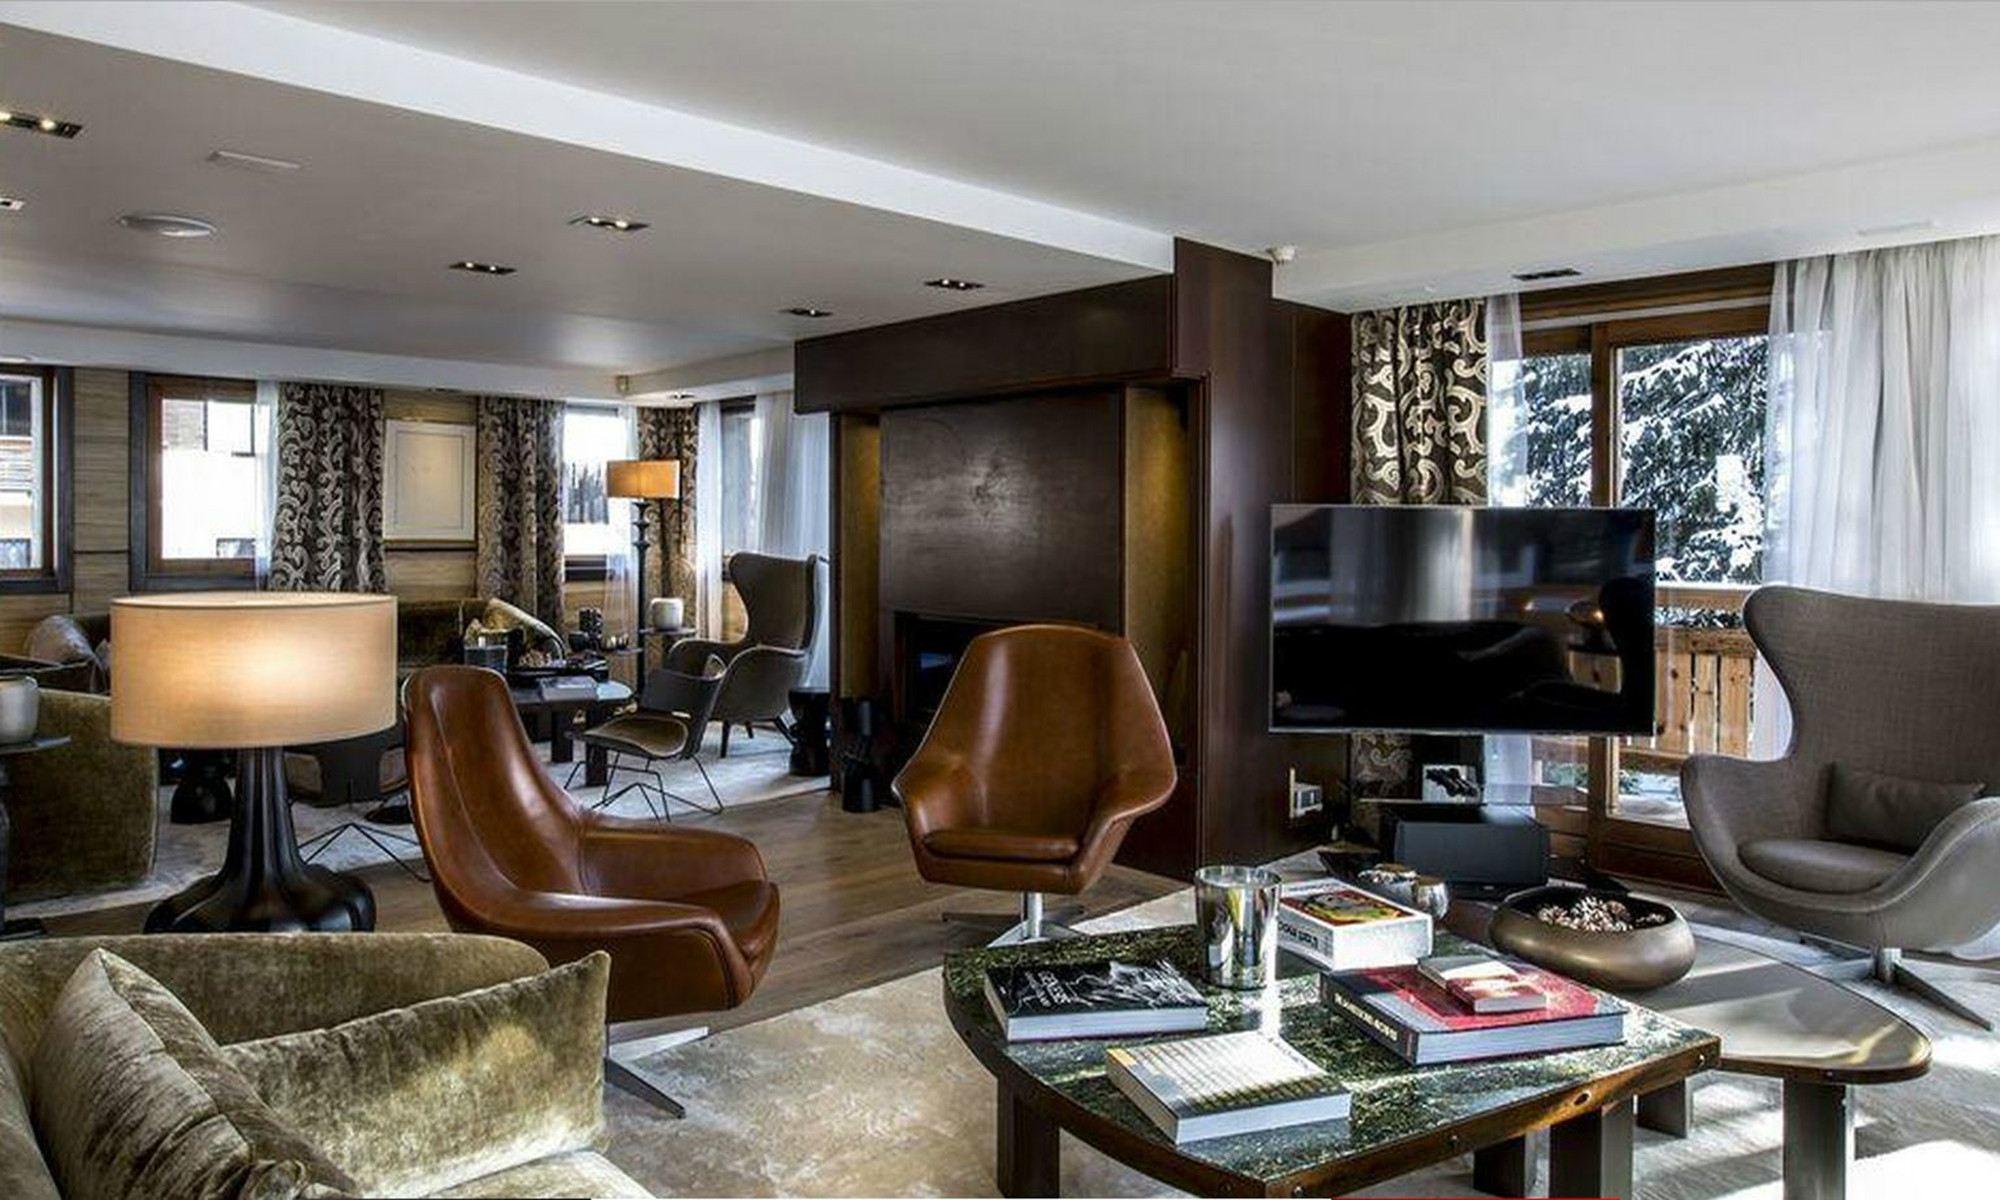 Property For Sale at Megève Village center Luxury Chalet Velours